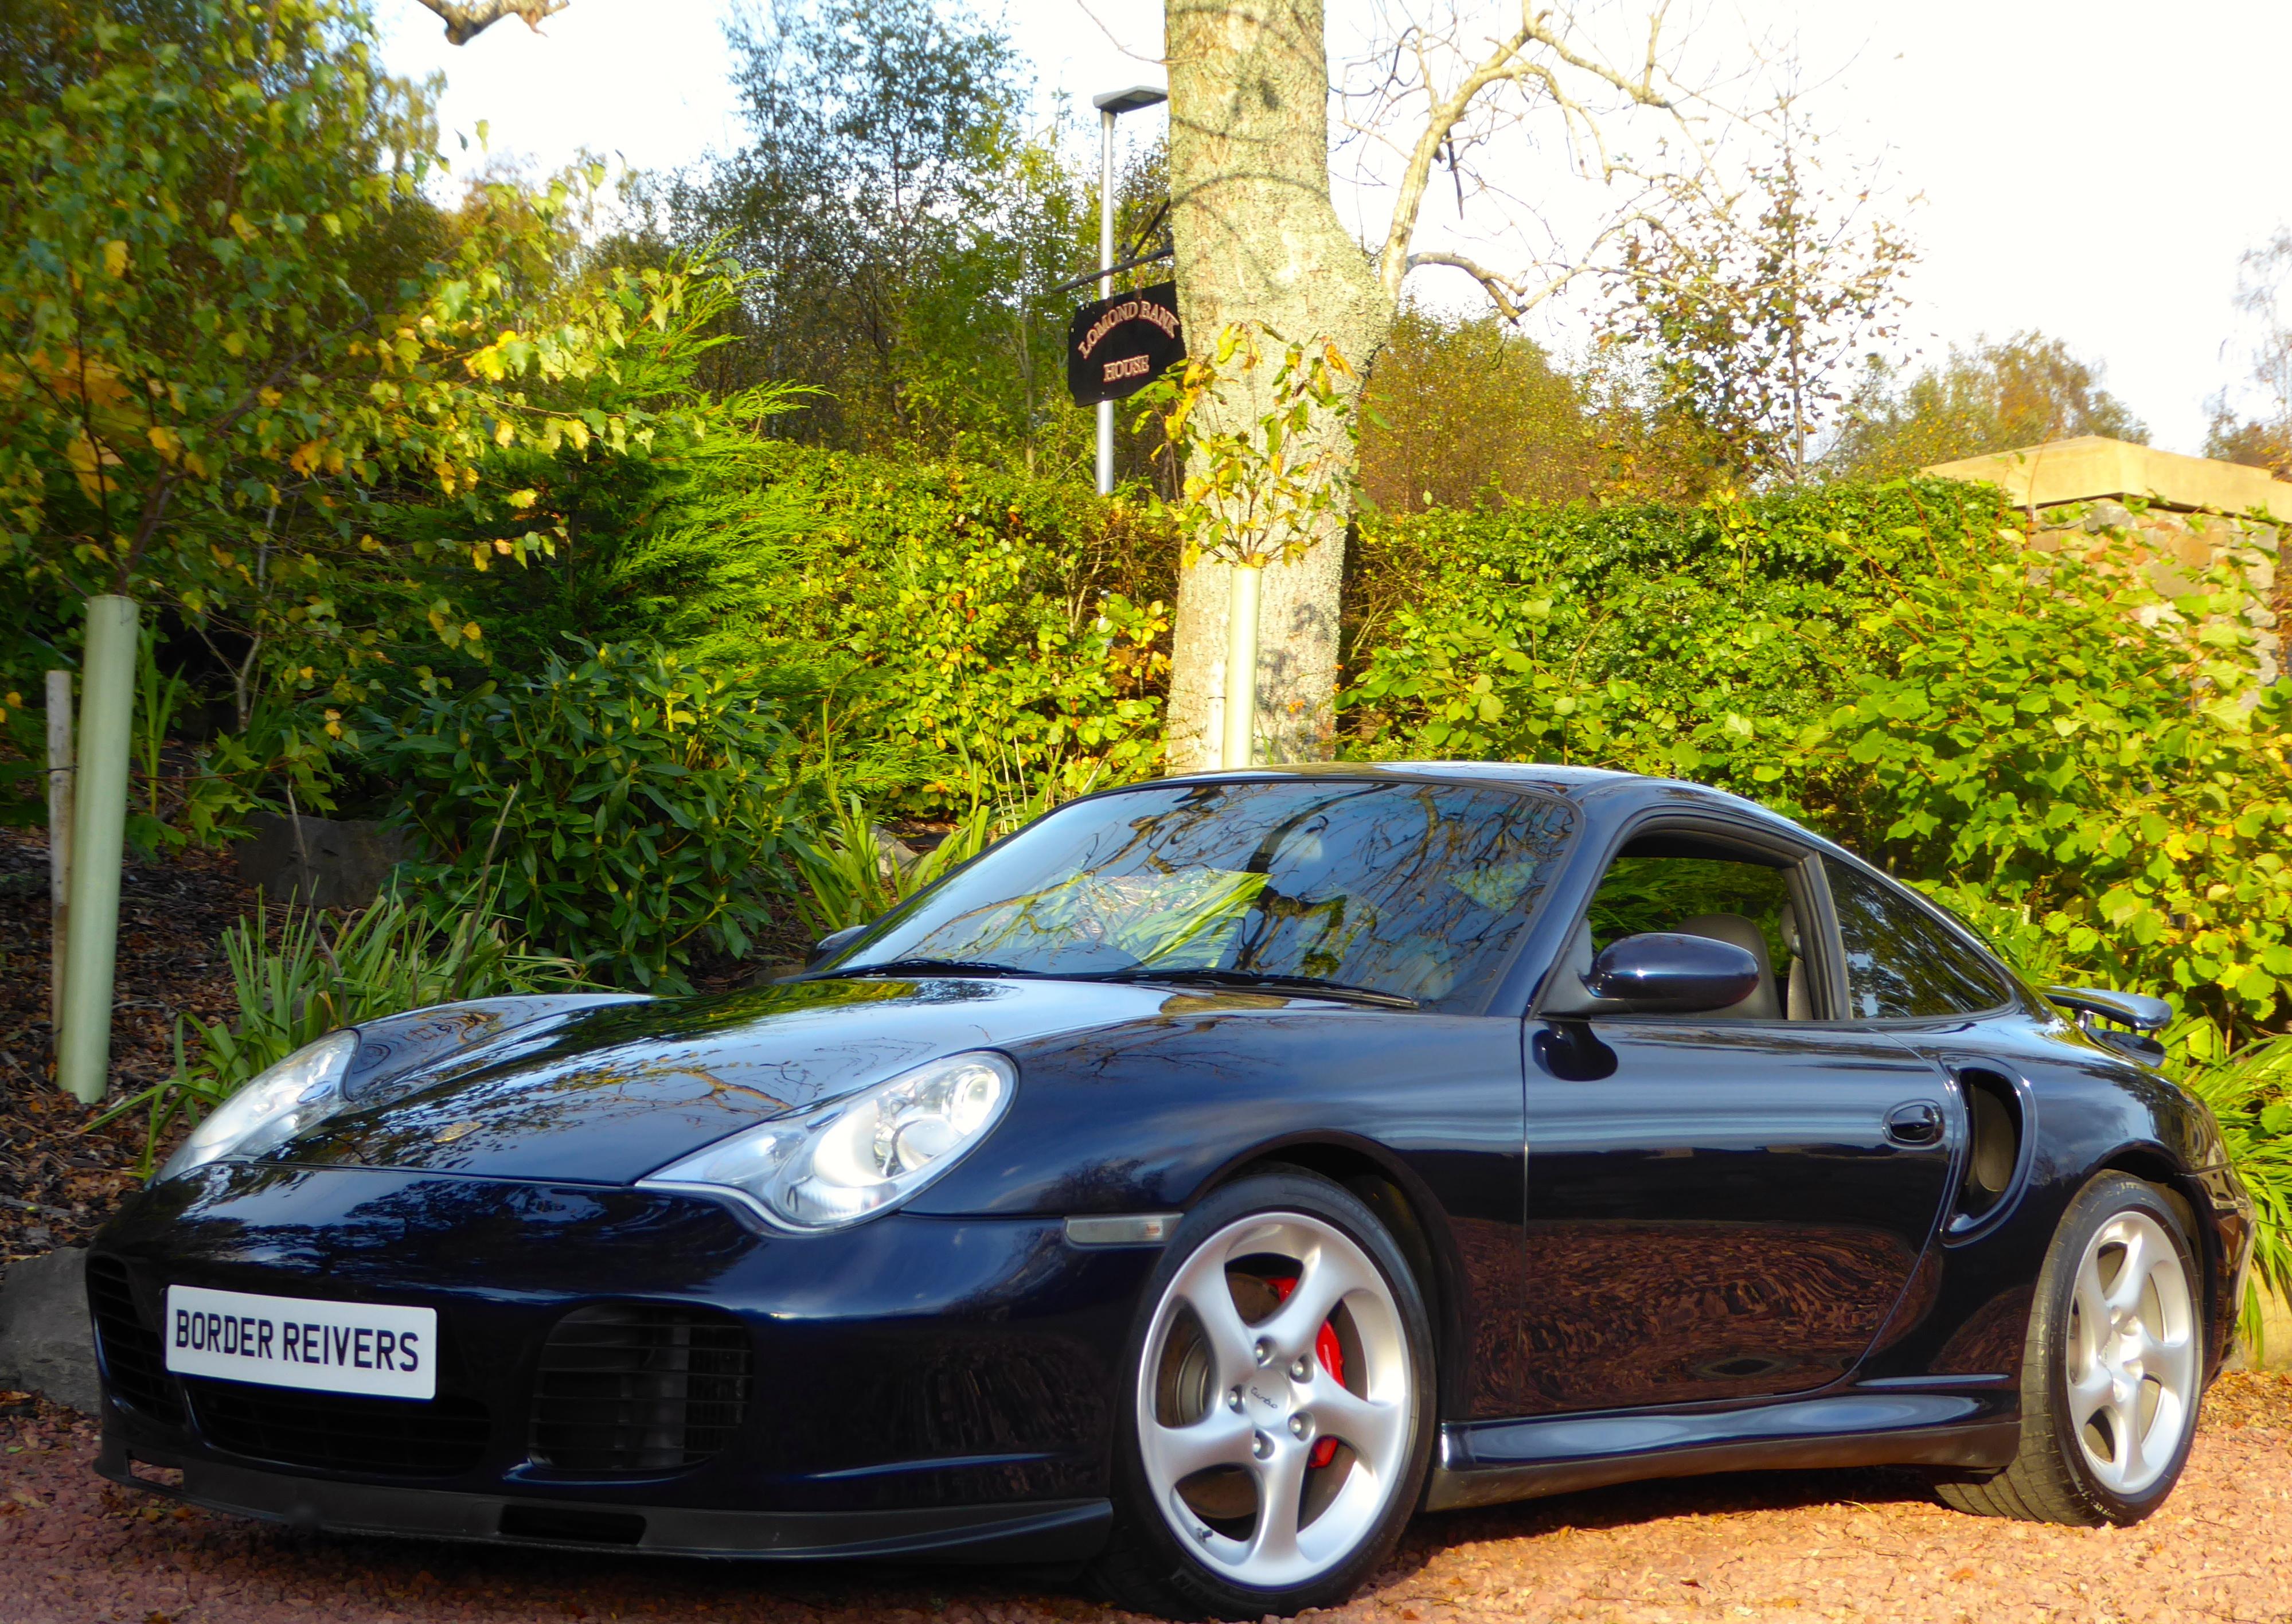 Porsche 996 Turbo >> Porsche 996 Turbo Border Reivers